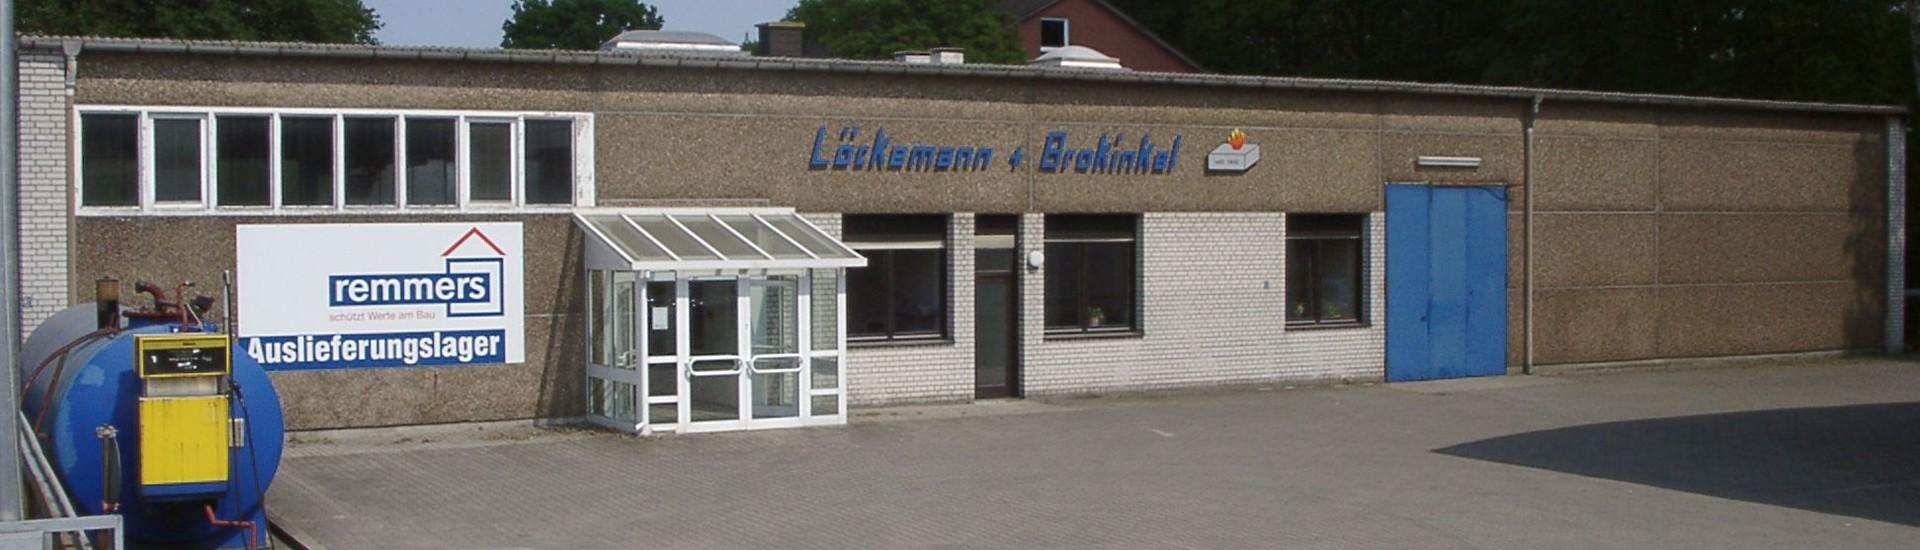 Loeckemann-Brokinkel